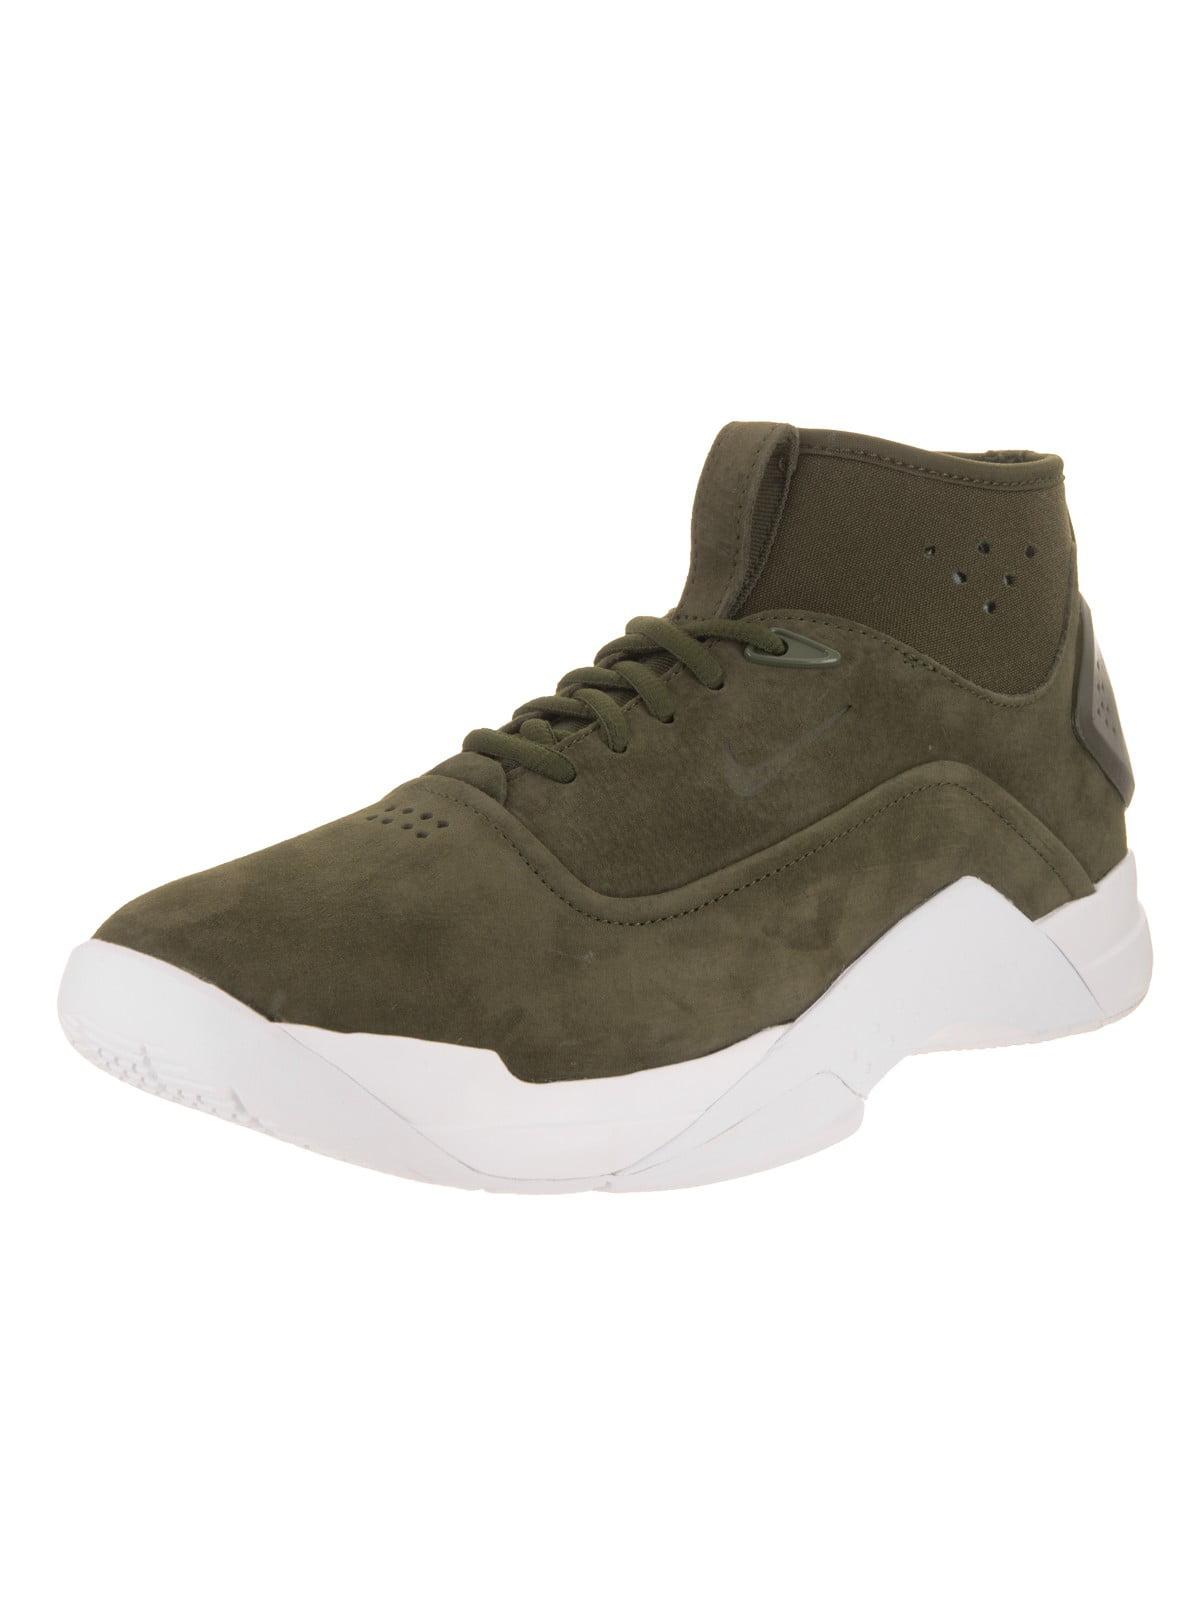 Nike Men's Hyperdunk Low Crft Basketball Shoe